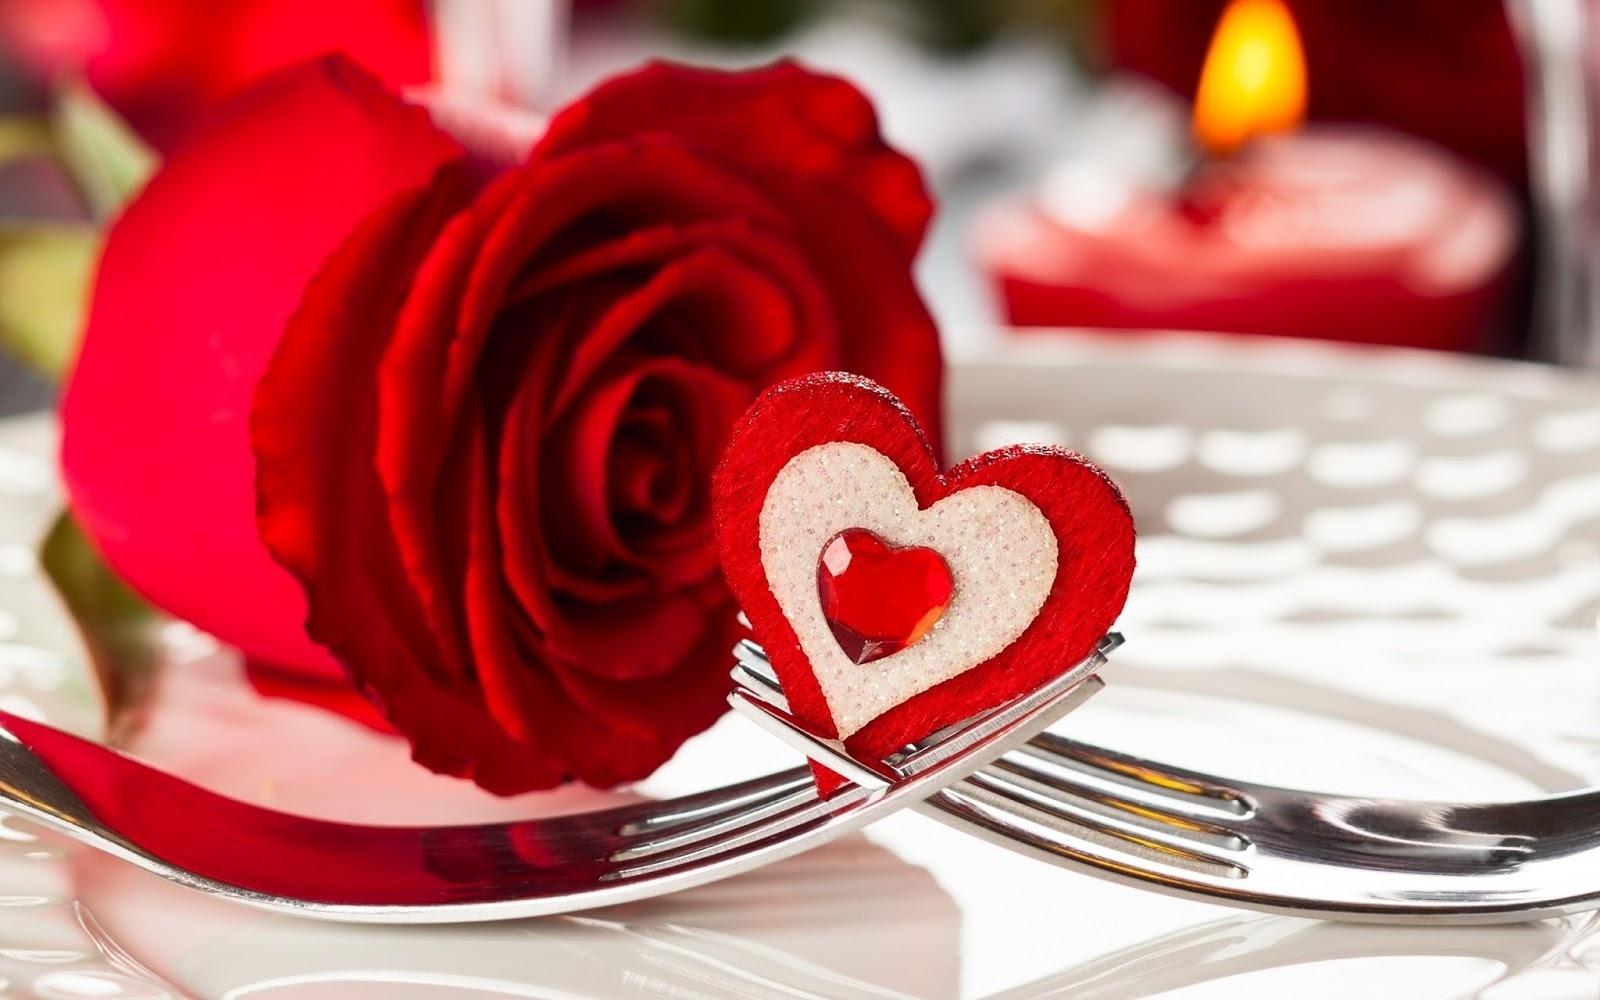 image of love rose hd desktop wallpaper download free 1920x1080